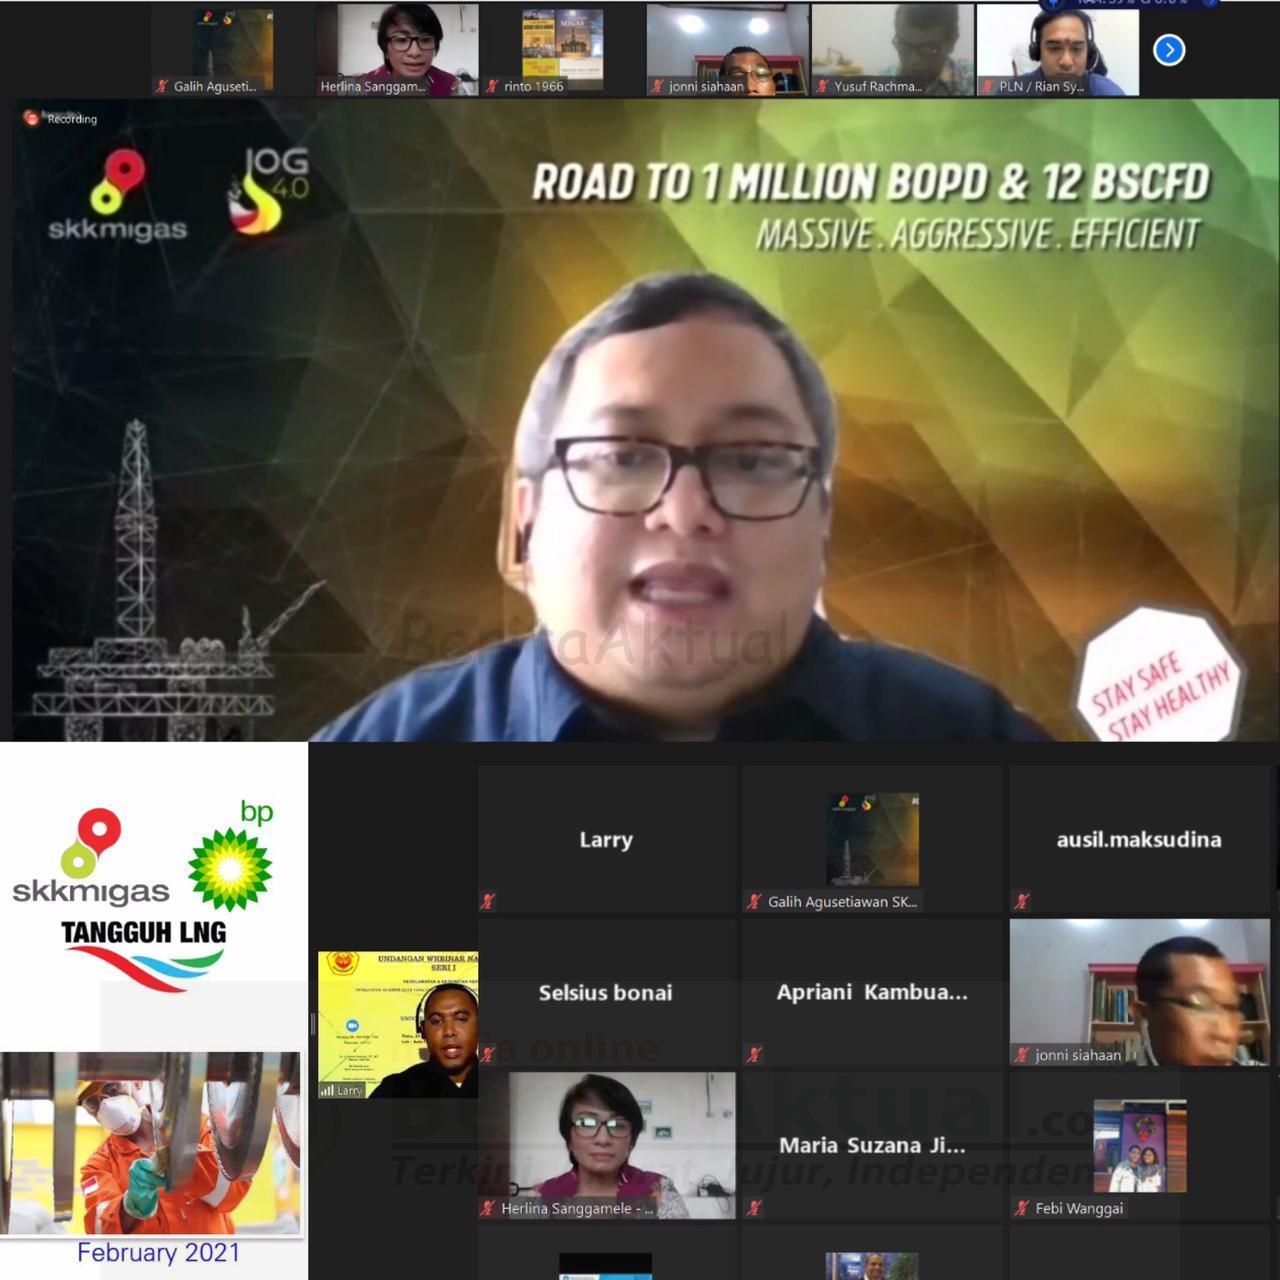 Industri Hulu Migas Wil Papua Maluku Dukung Pencanangan Bulan K3 Bersama Civitas Akademika Uncen 5 IMG 20210225 WA0001